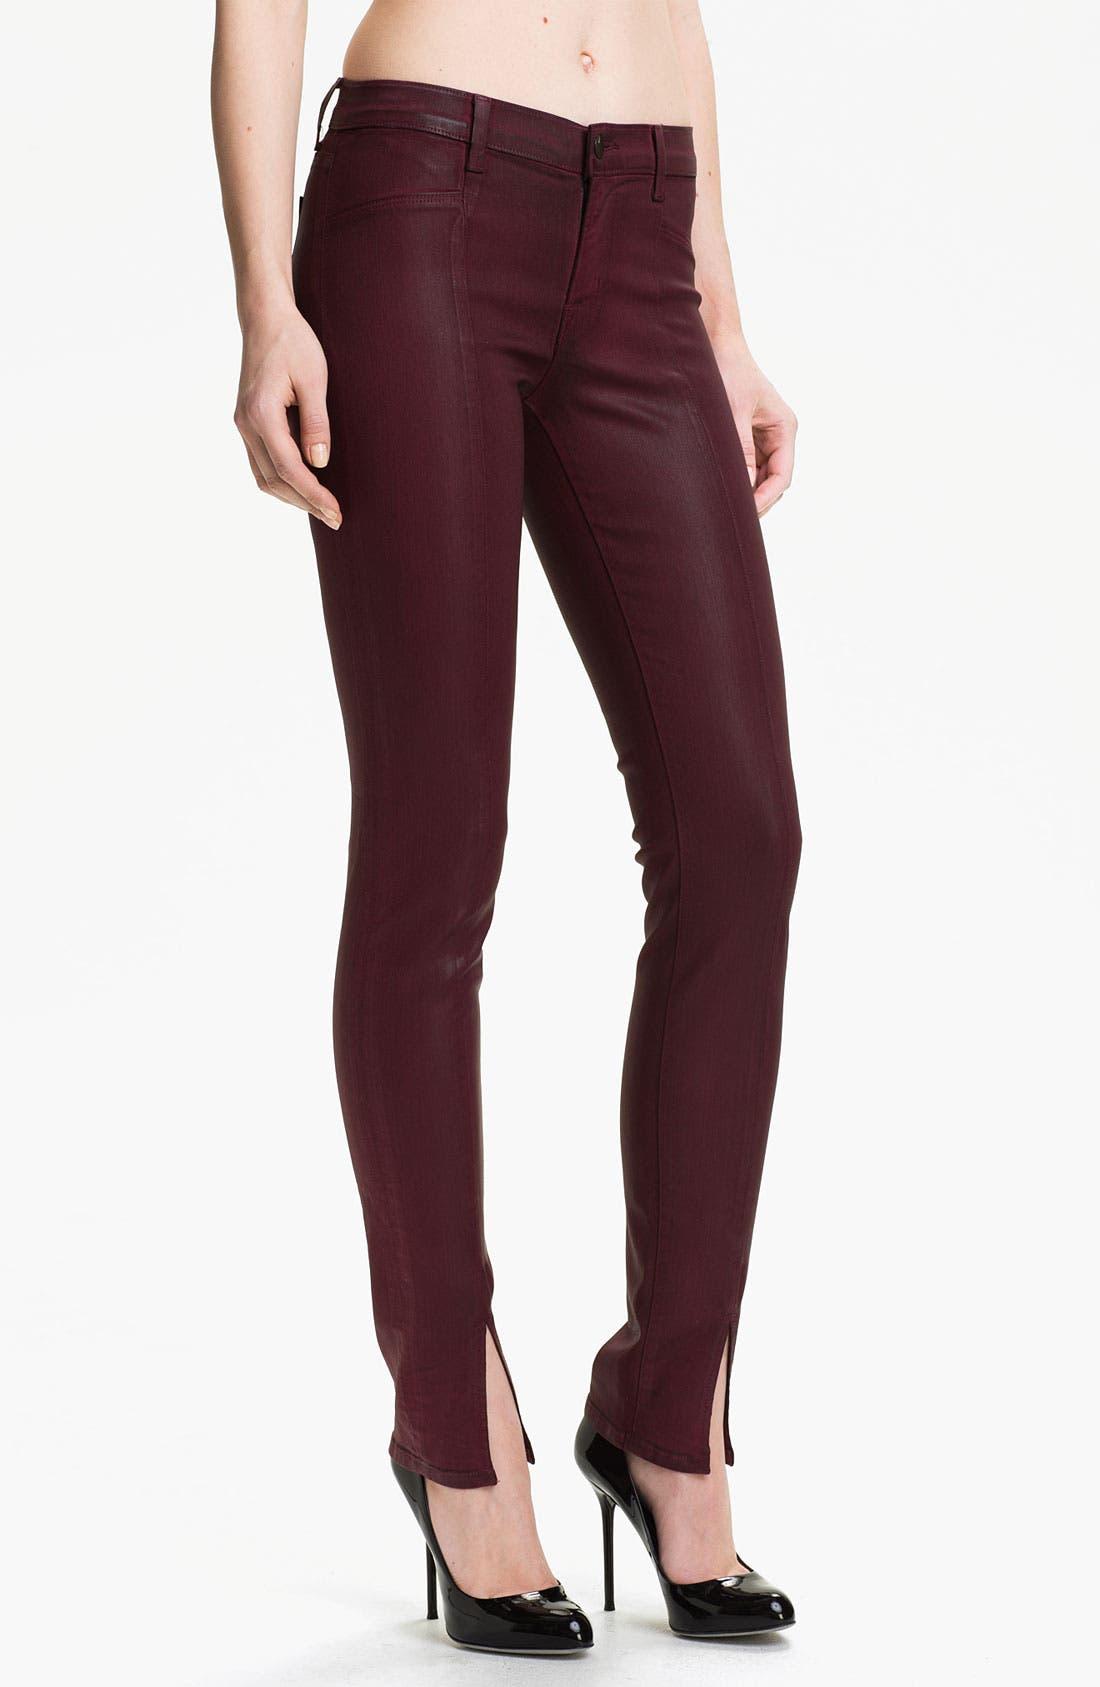 Alternate Image 1 Selected - J Brand Coated Stretch Skinny Jeans